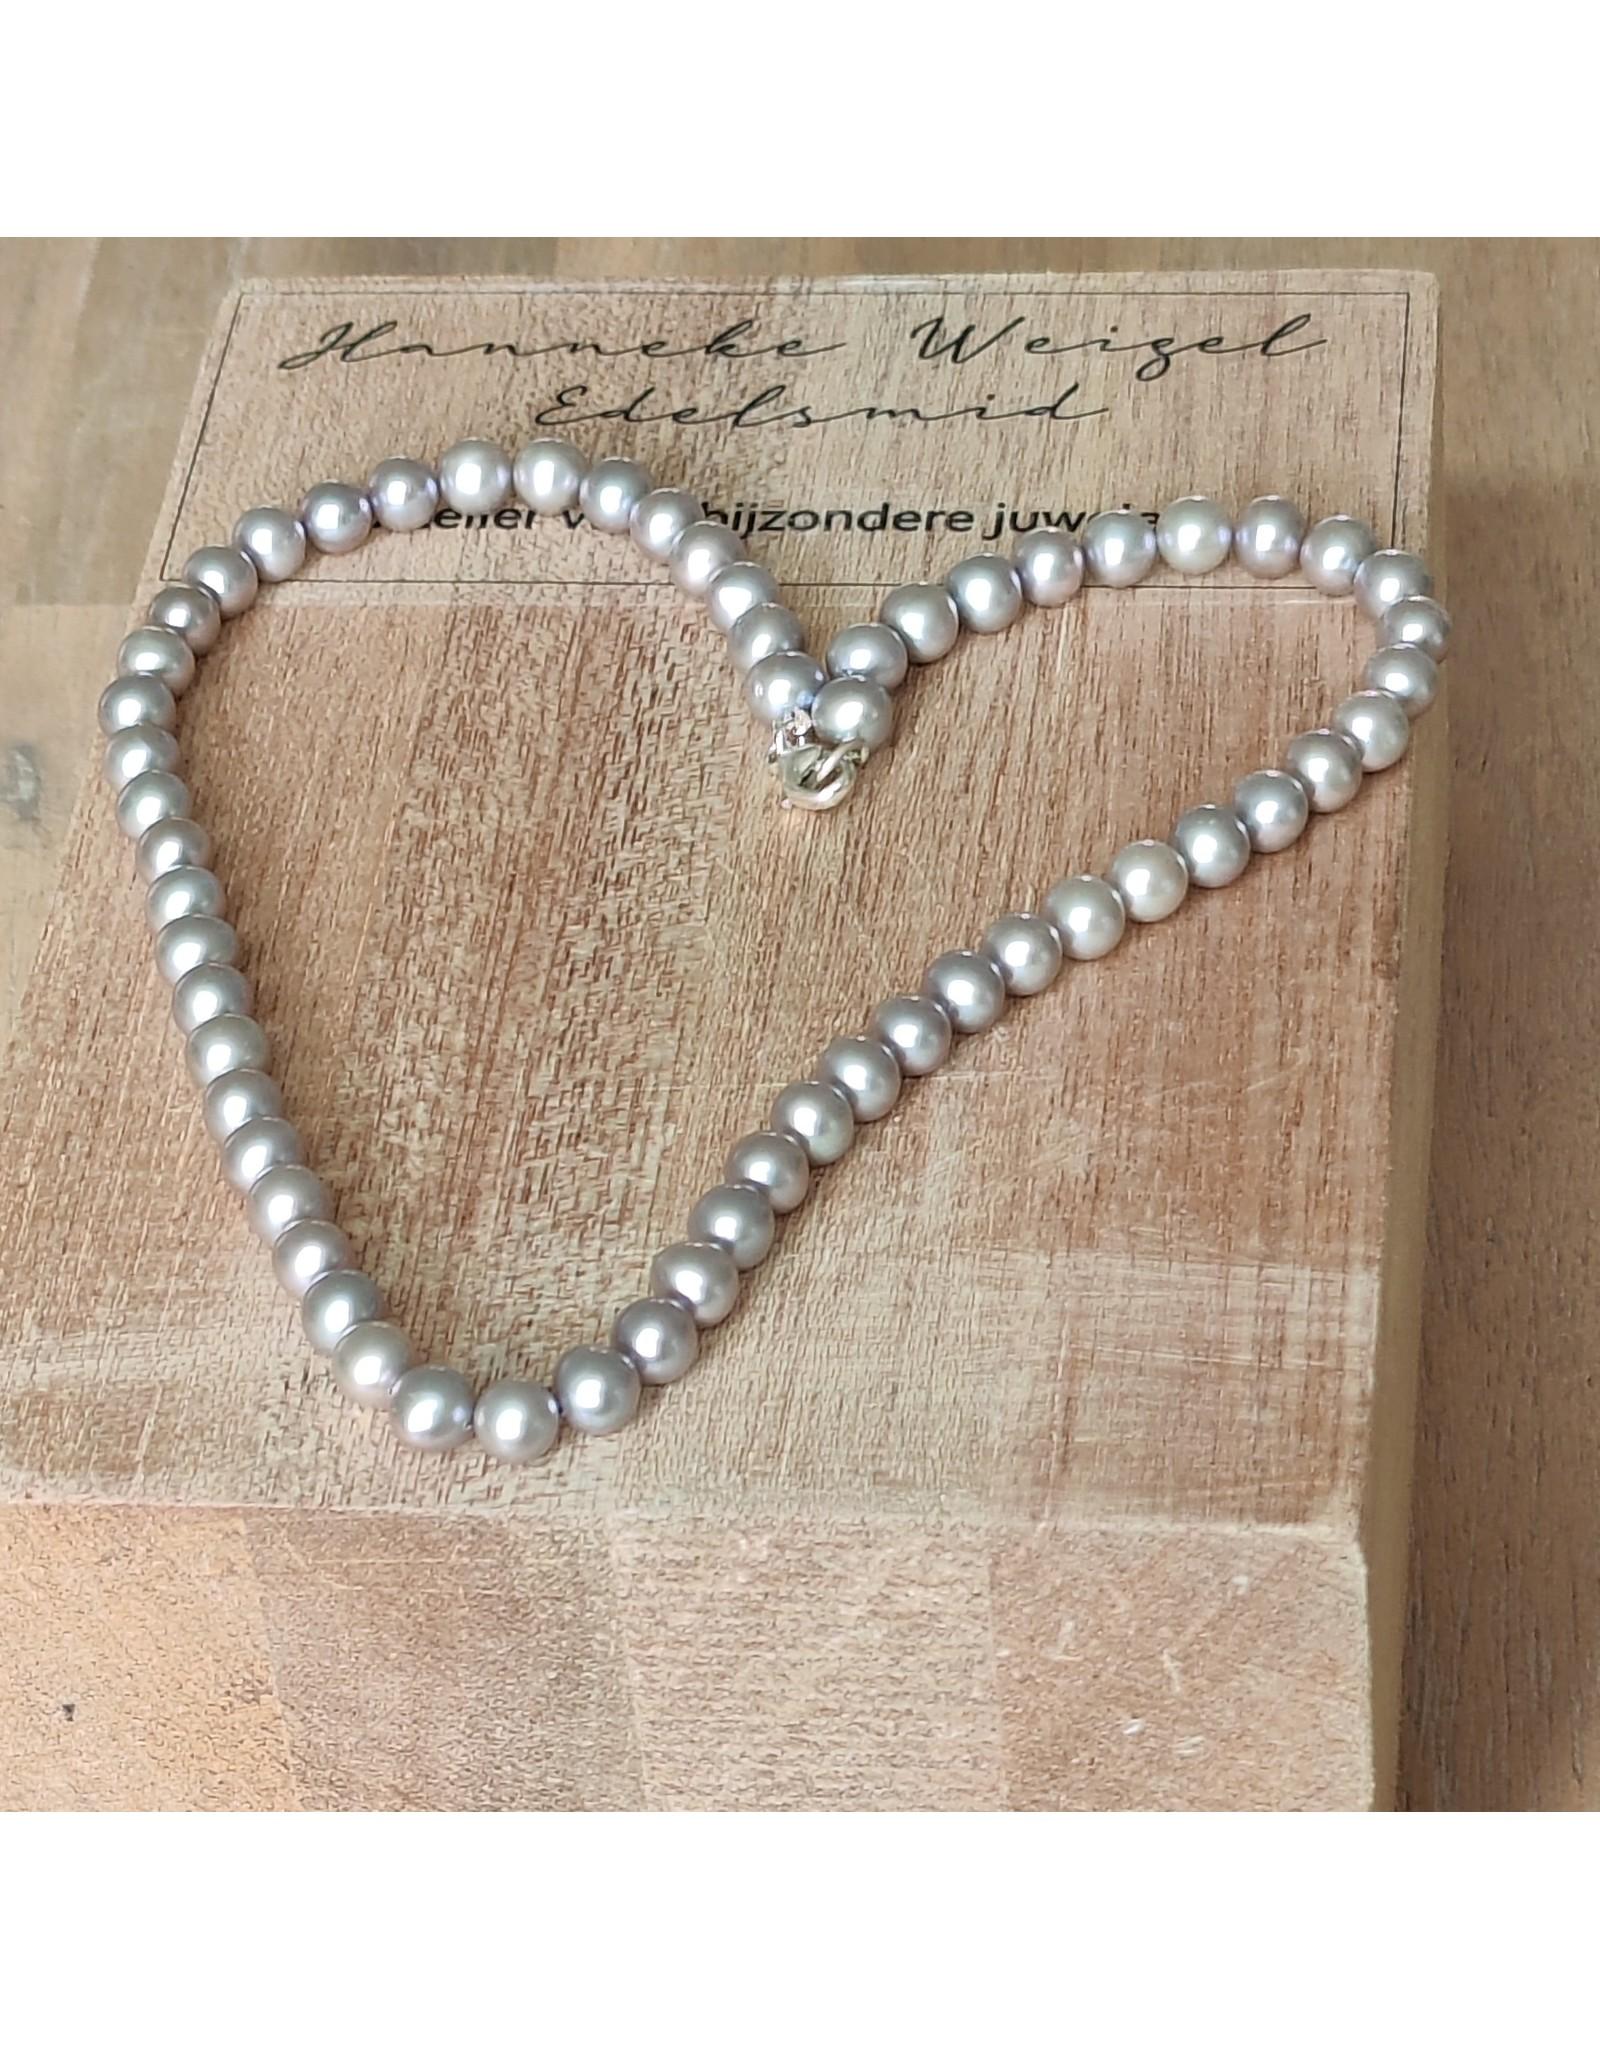 Handmade by Hanneke Weigel Pearl necklace grey tones round 7.0-7.5mm